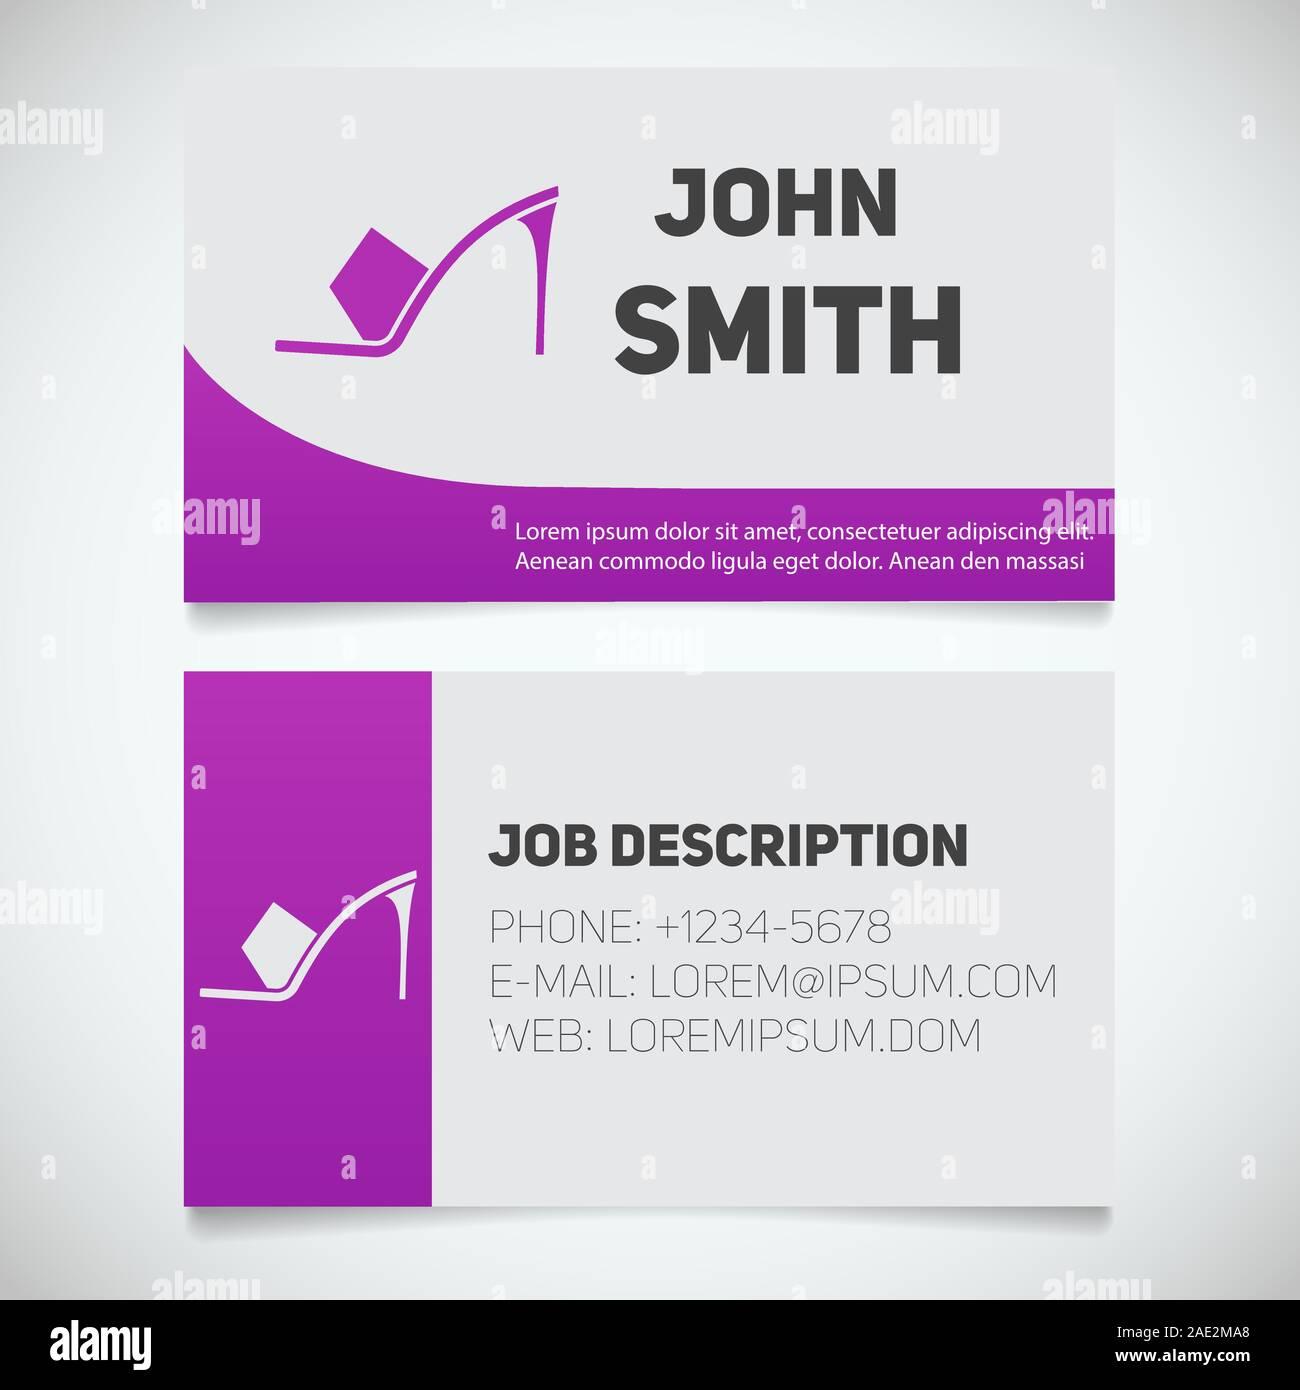 Business card print template with high heel shoe logo. Women